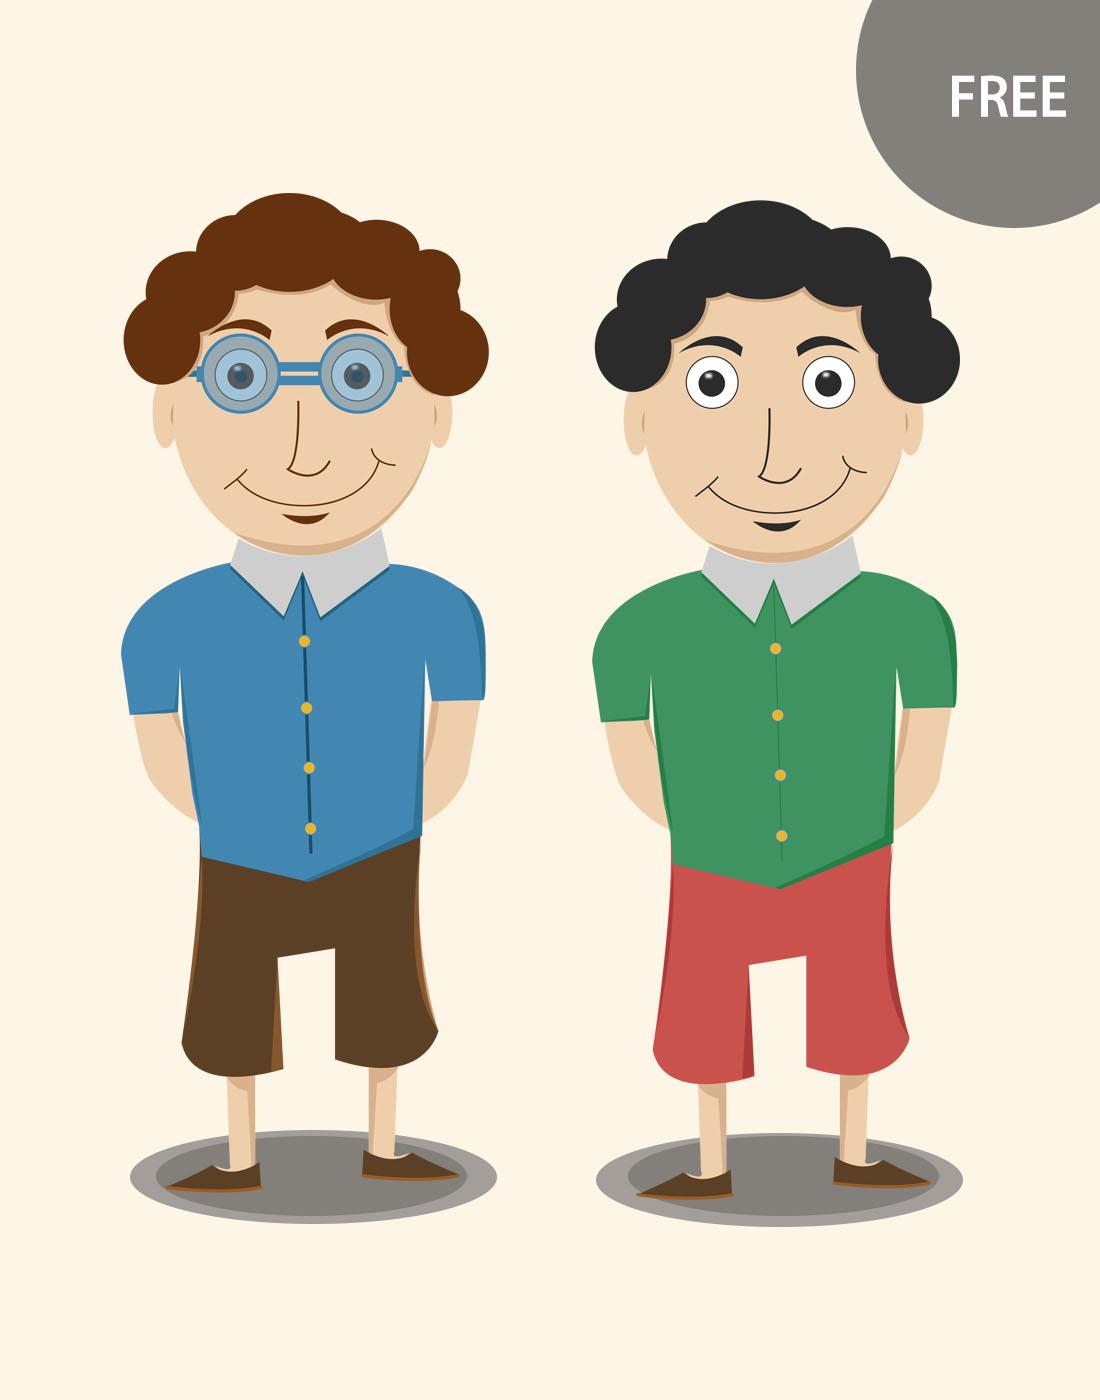 Cartoon Character Design Free Software : Free vector cartoon characters